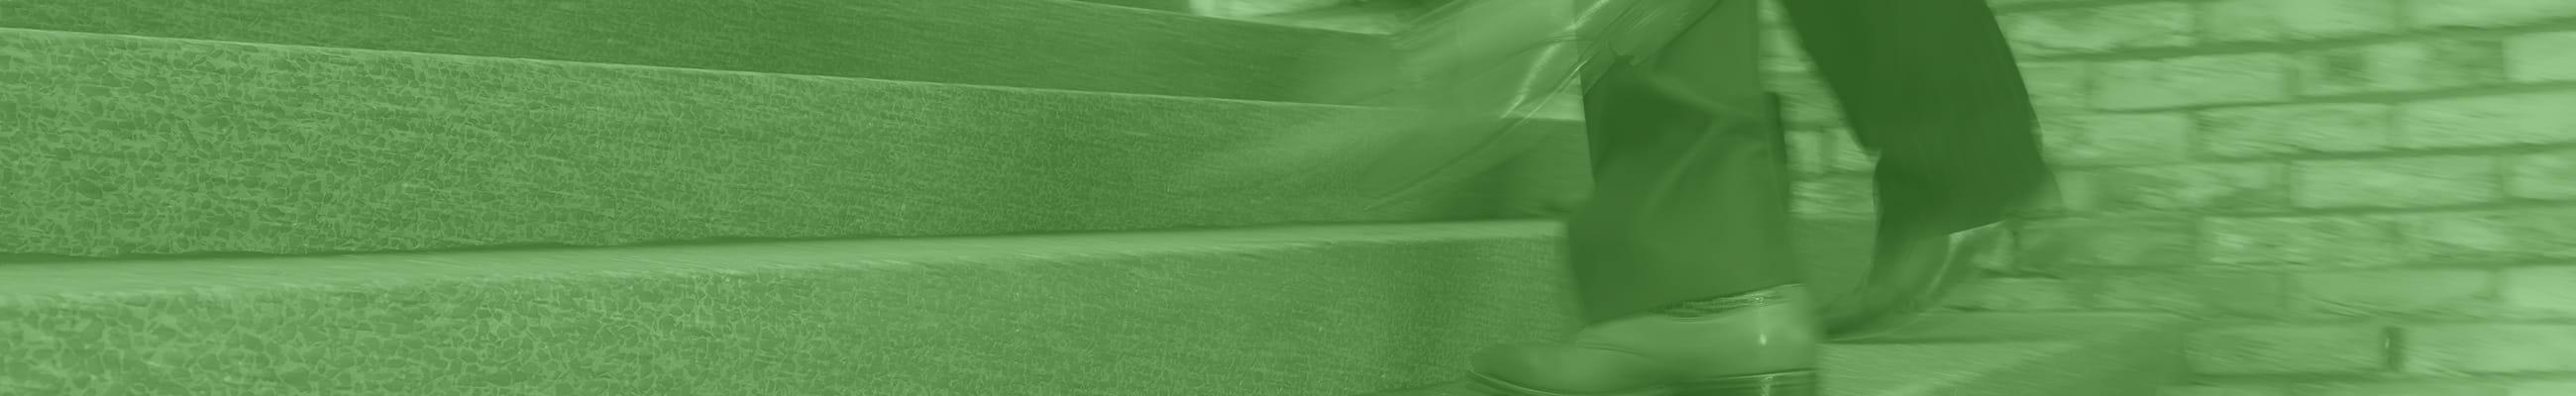 traplopen groen